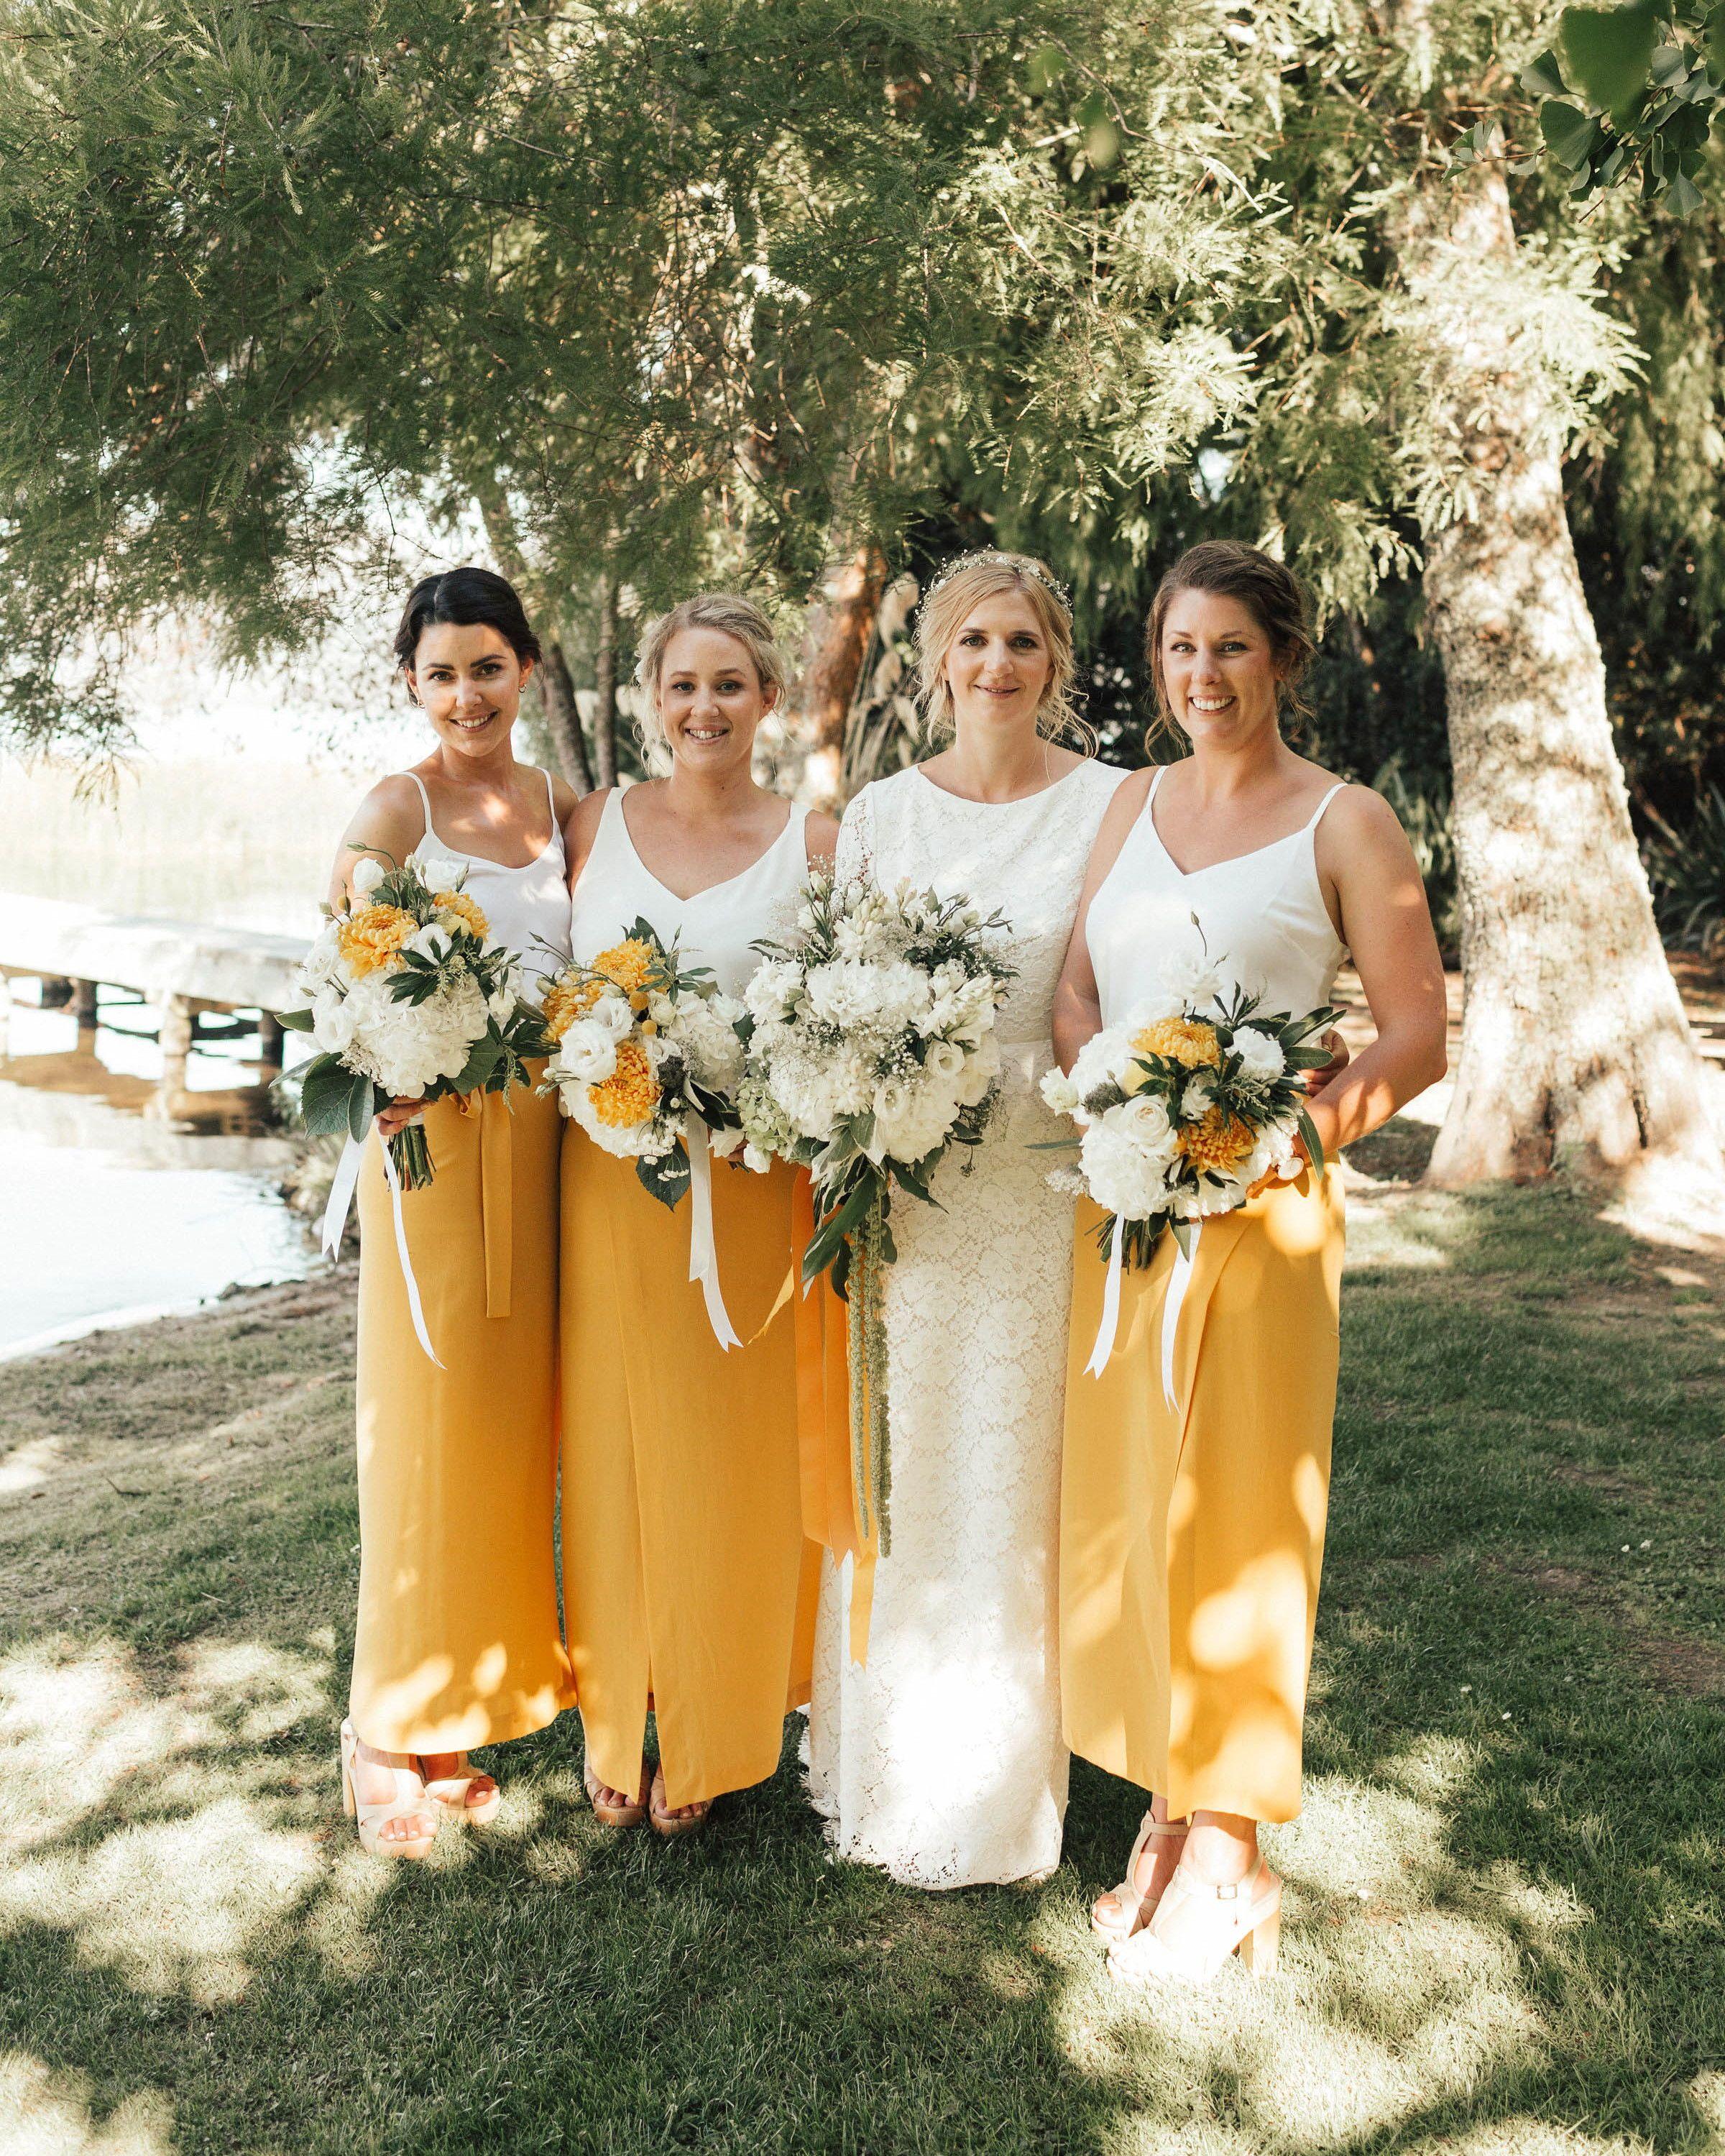 Trending Now Two Piece Bridesmaids Looks Yellow Bridesmaids Yellow Bridesmaid Dresses White Bridesmaid Dresses